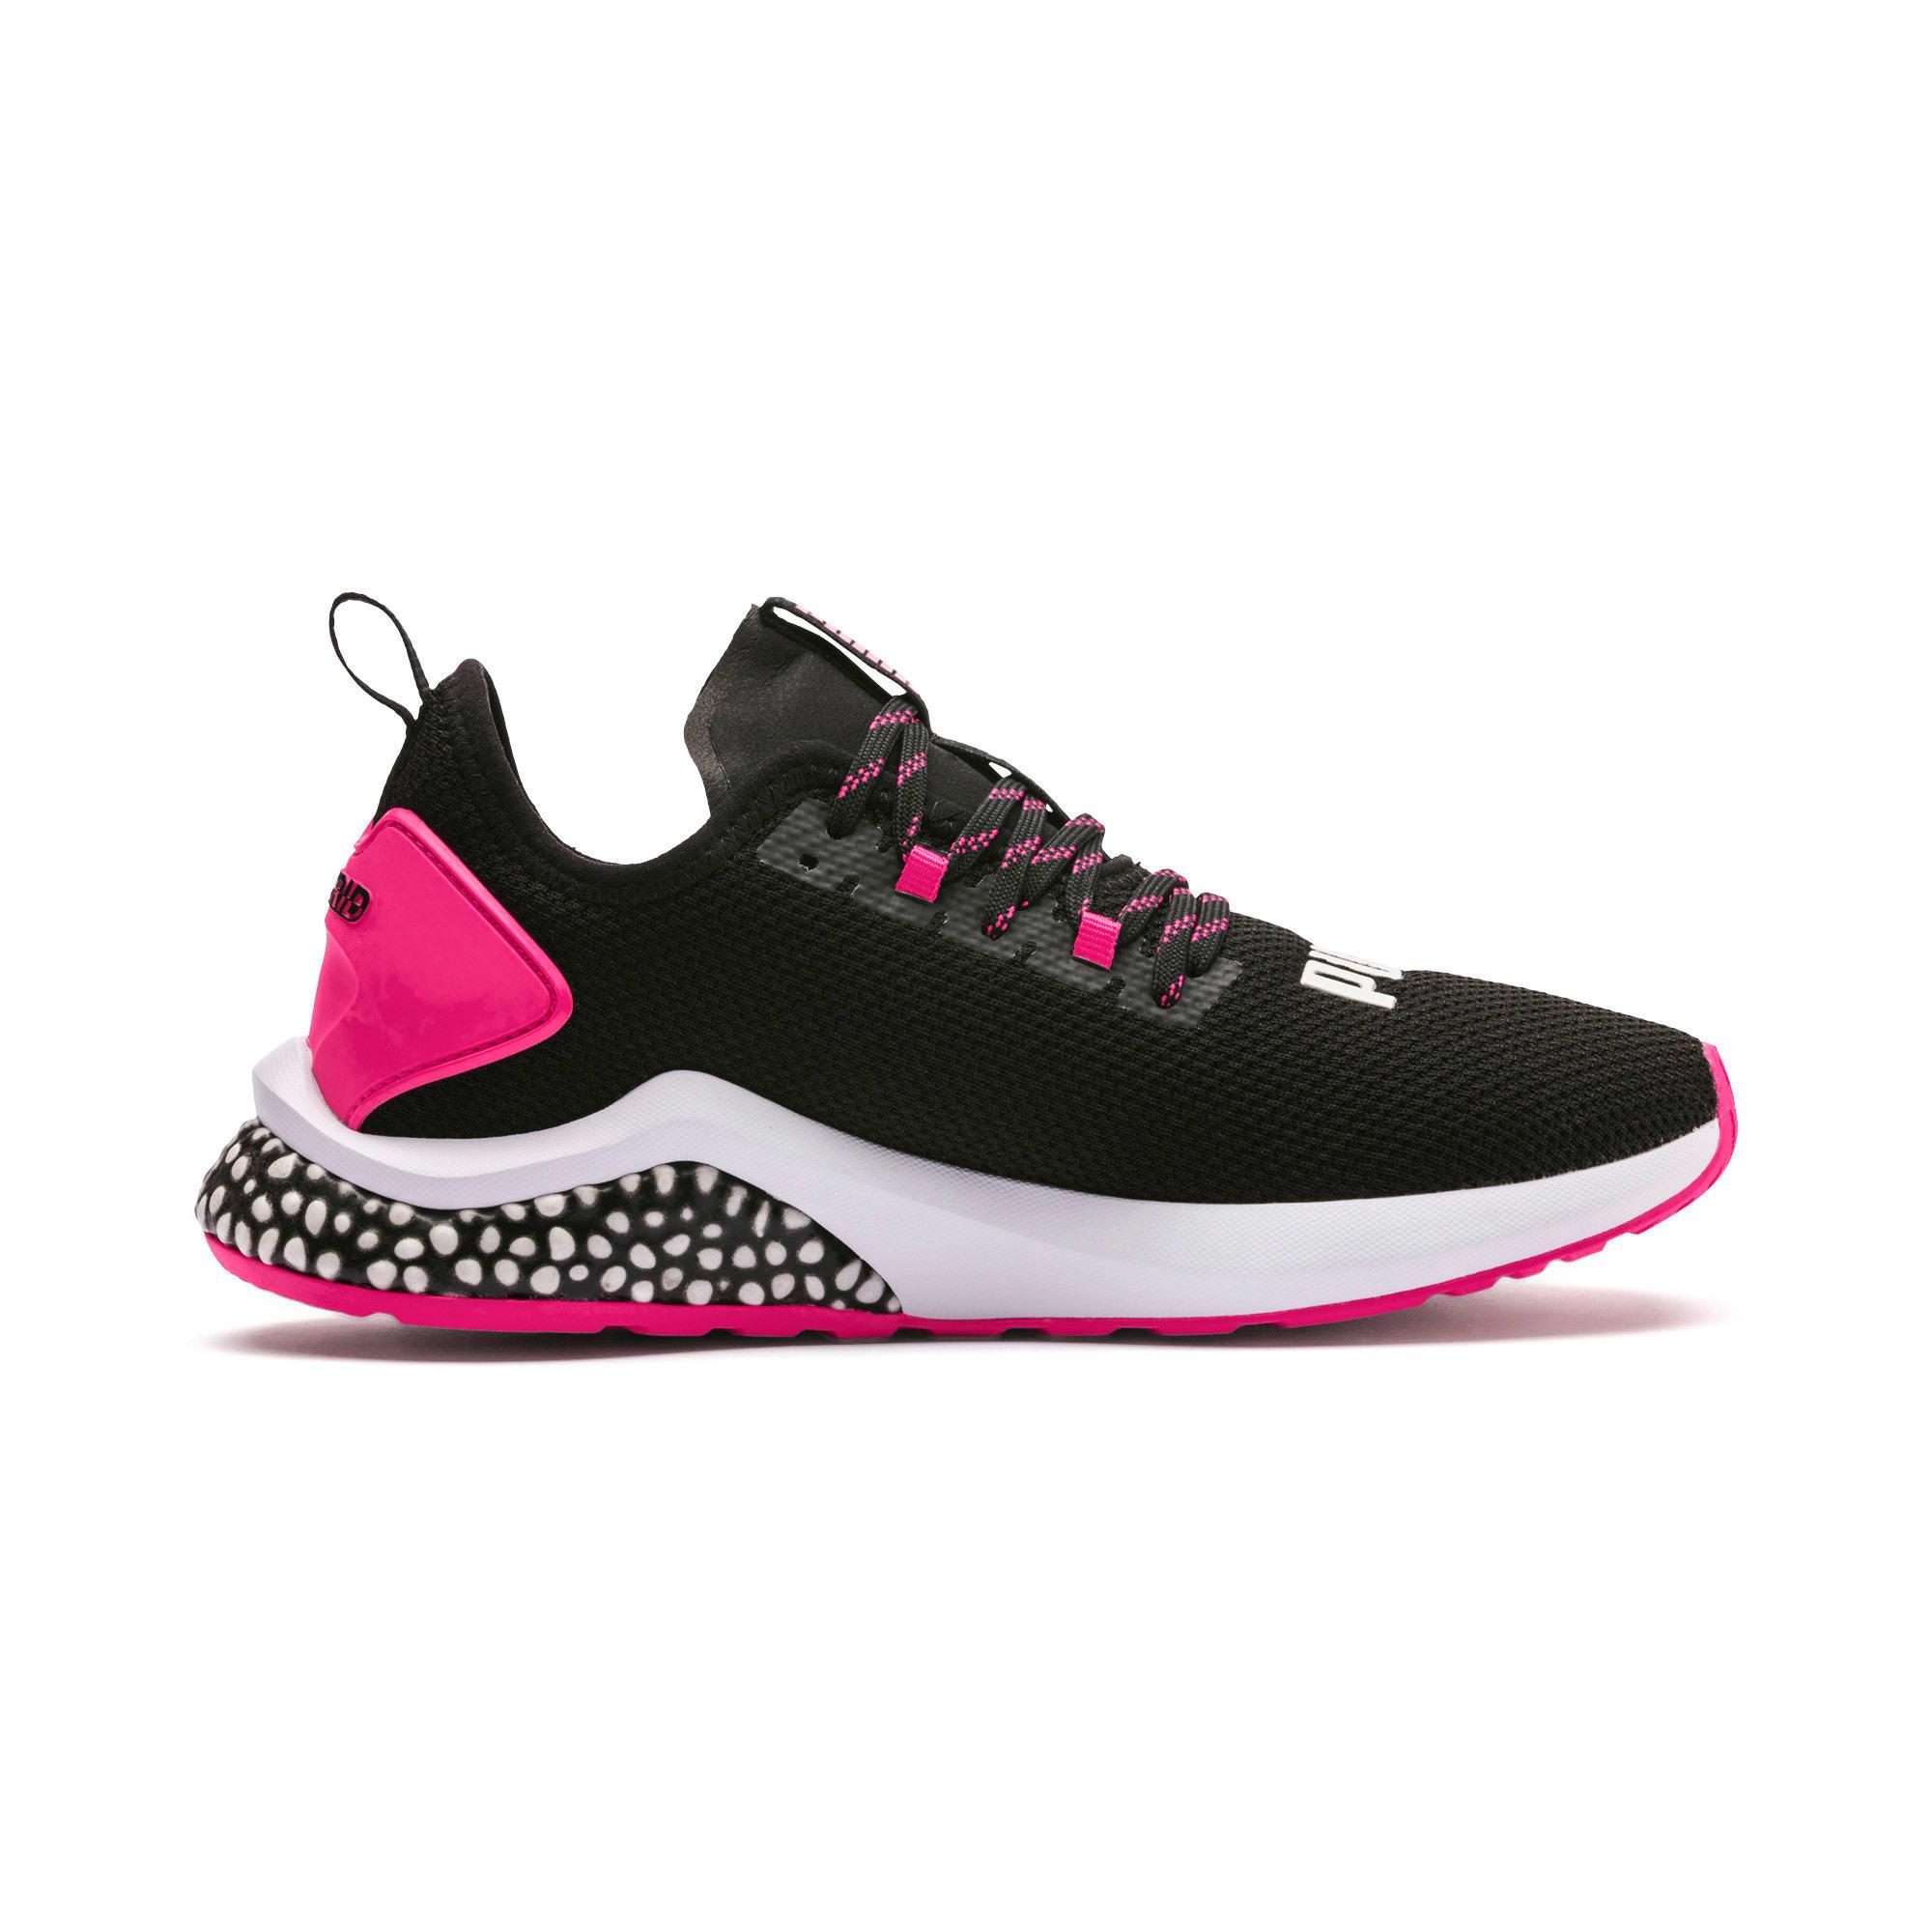 Miniatura 6 de Zapatos para correr HYBRID NX para mujer, Puma Black-Fuchsia Purple, mediano